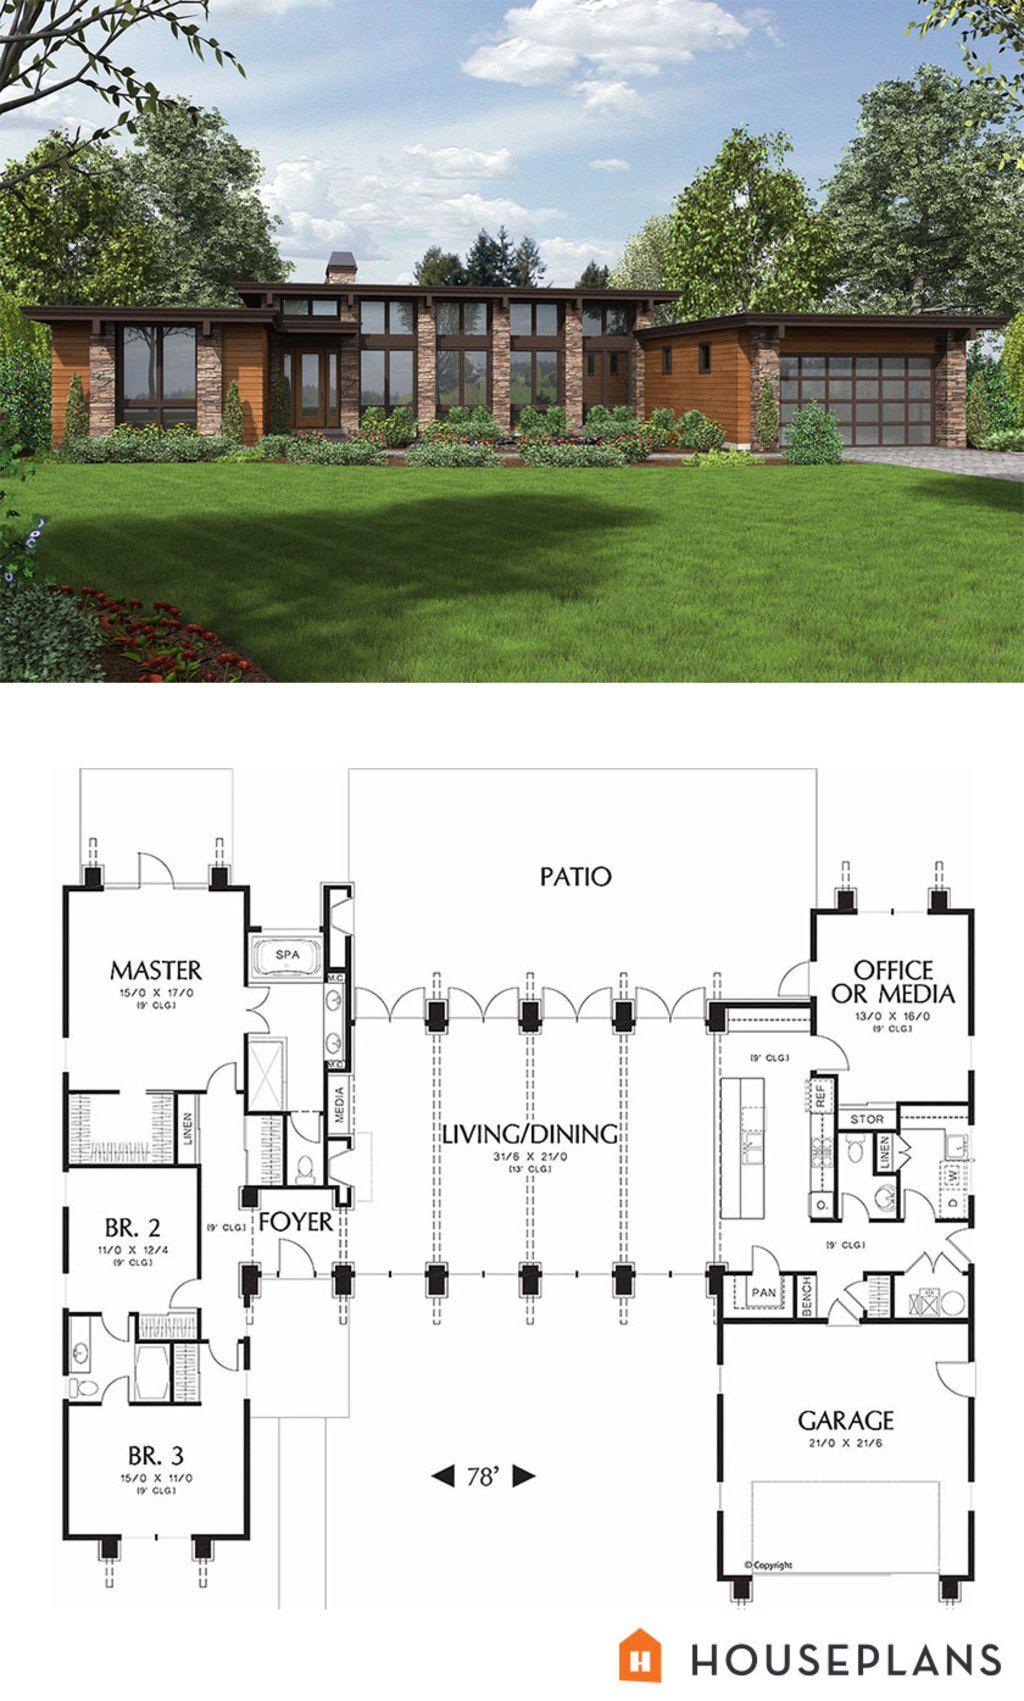 Modern Style House Plan 3 Beds 2 5 Baths 2557 Sq Ft Plan 48 476 Modern Style House Plans Modern House Floor Plans Modern Floor Plans